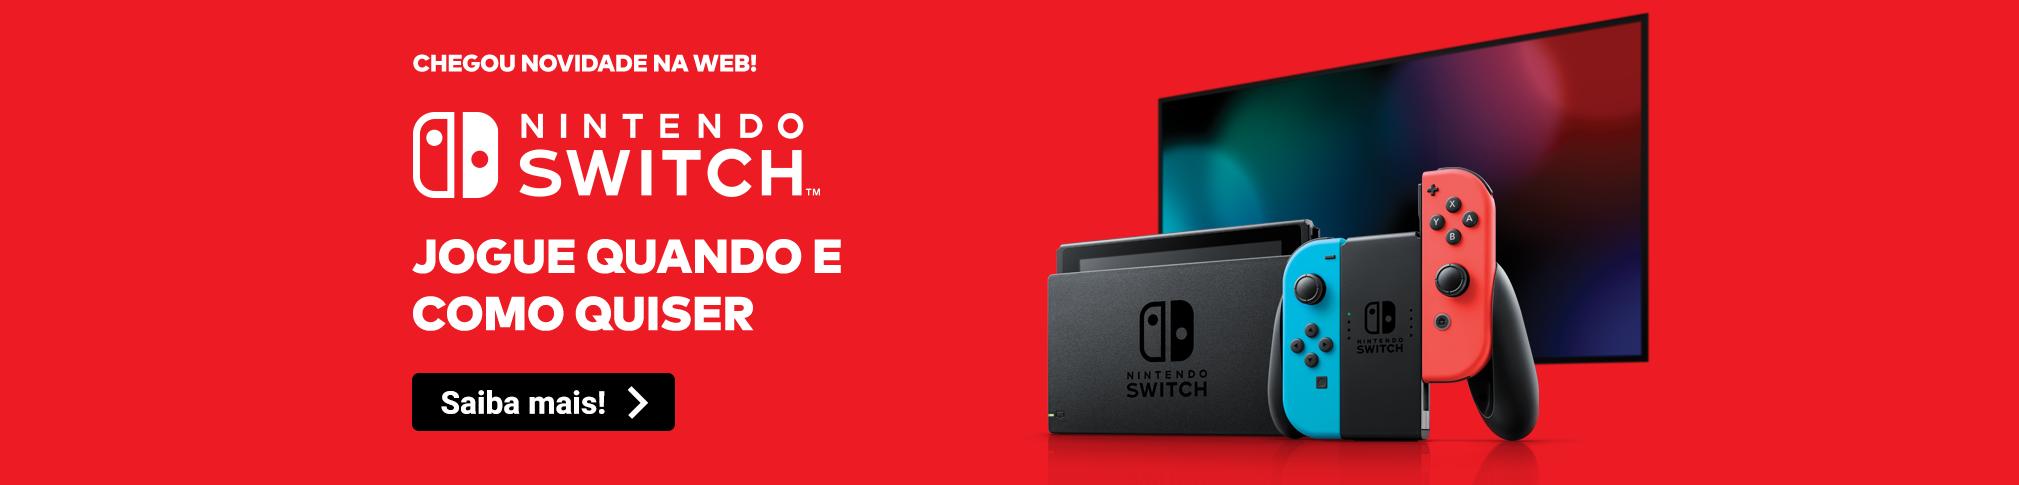 banner nintendo switch